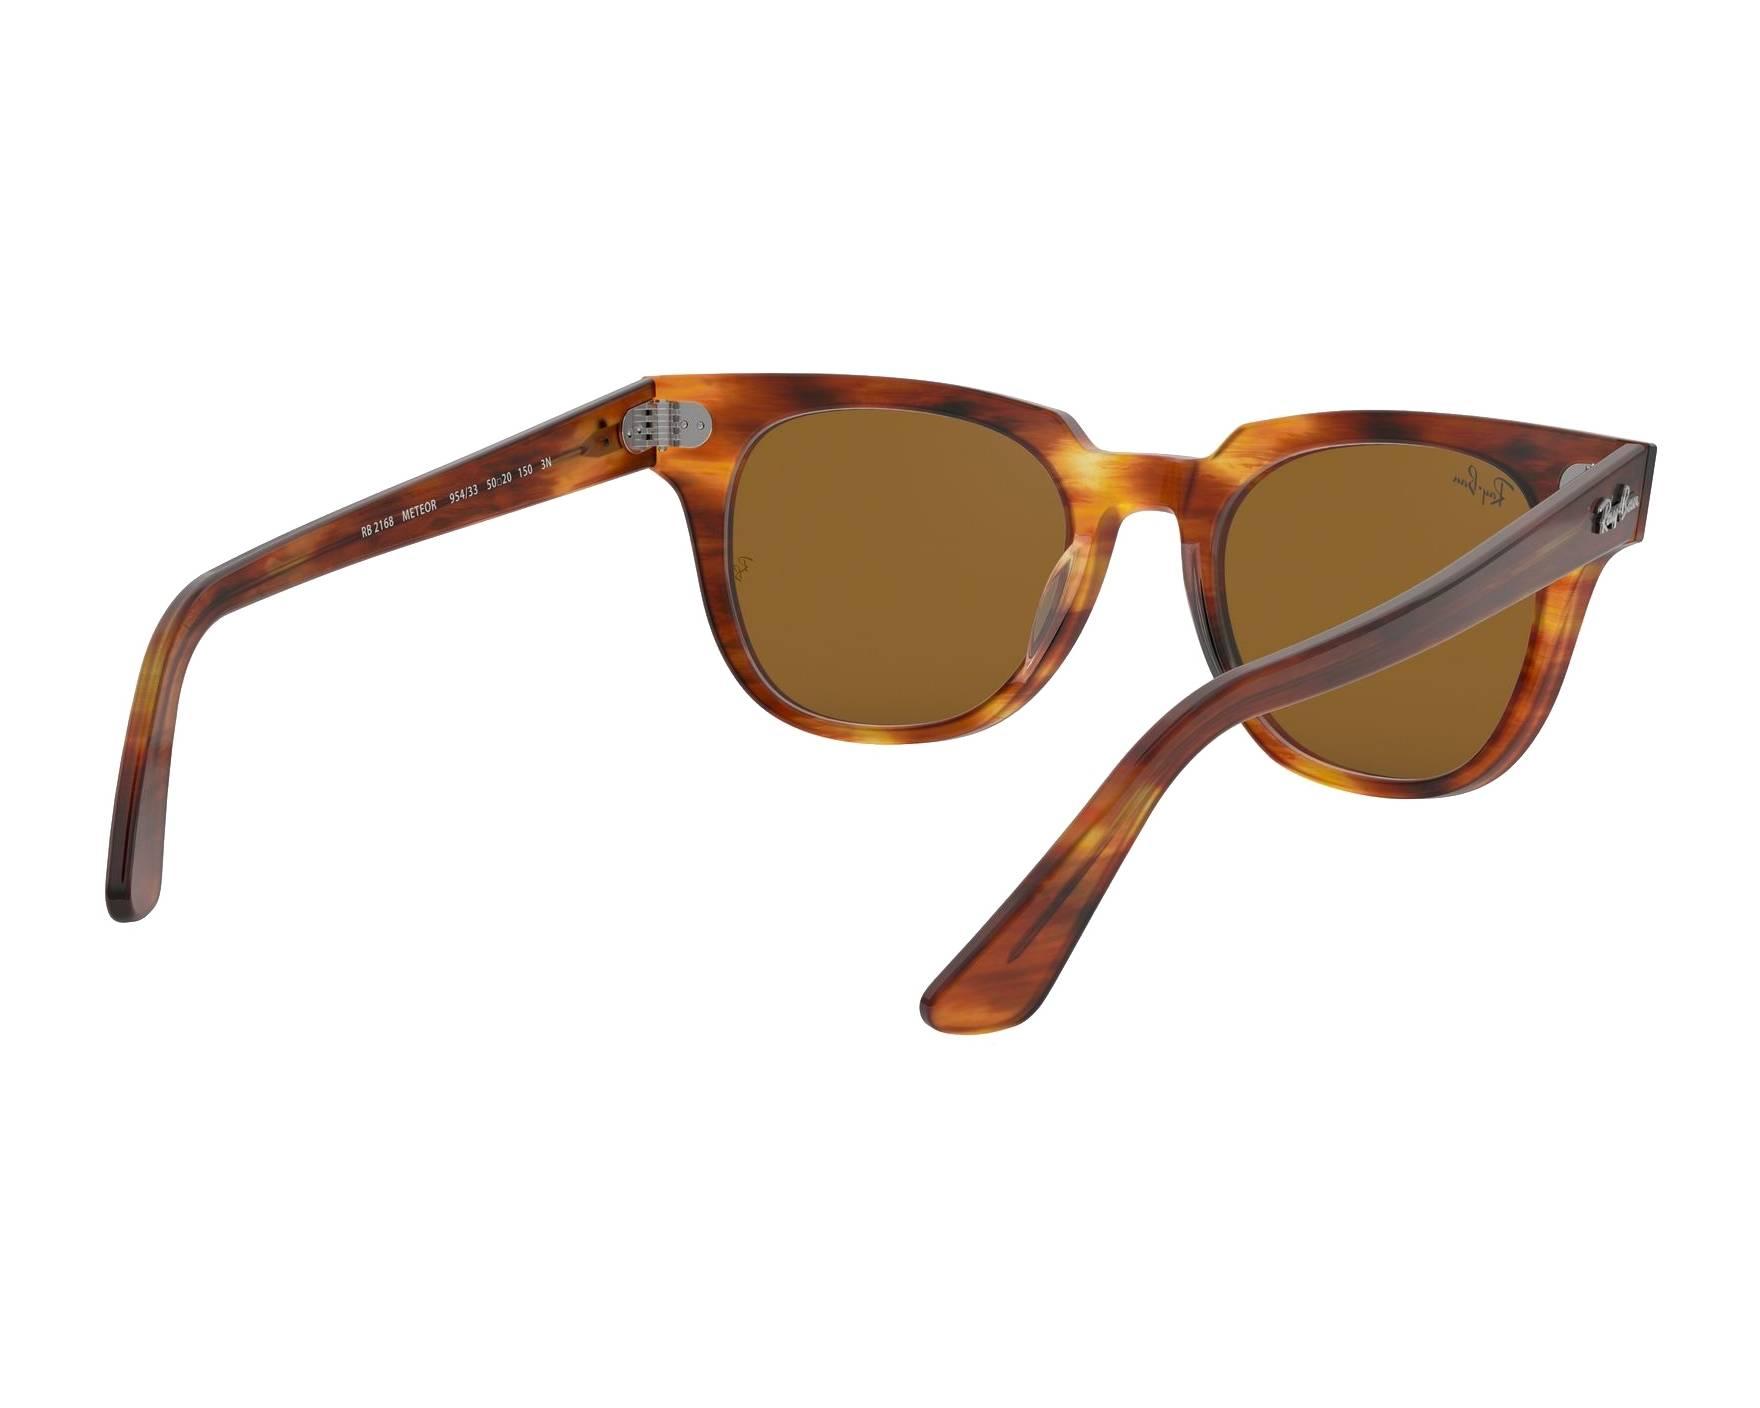 ec06cefa0c1 Sunglasses Ray-Ban RB-2168 954 33 50-20 Havana 360 degree